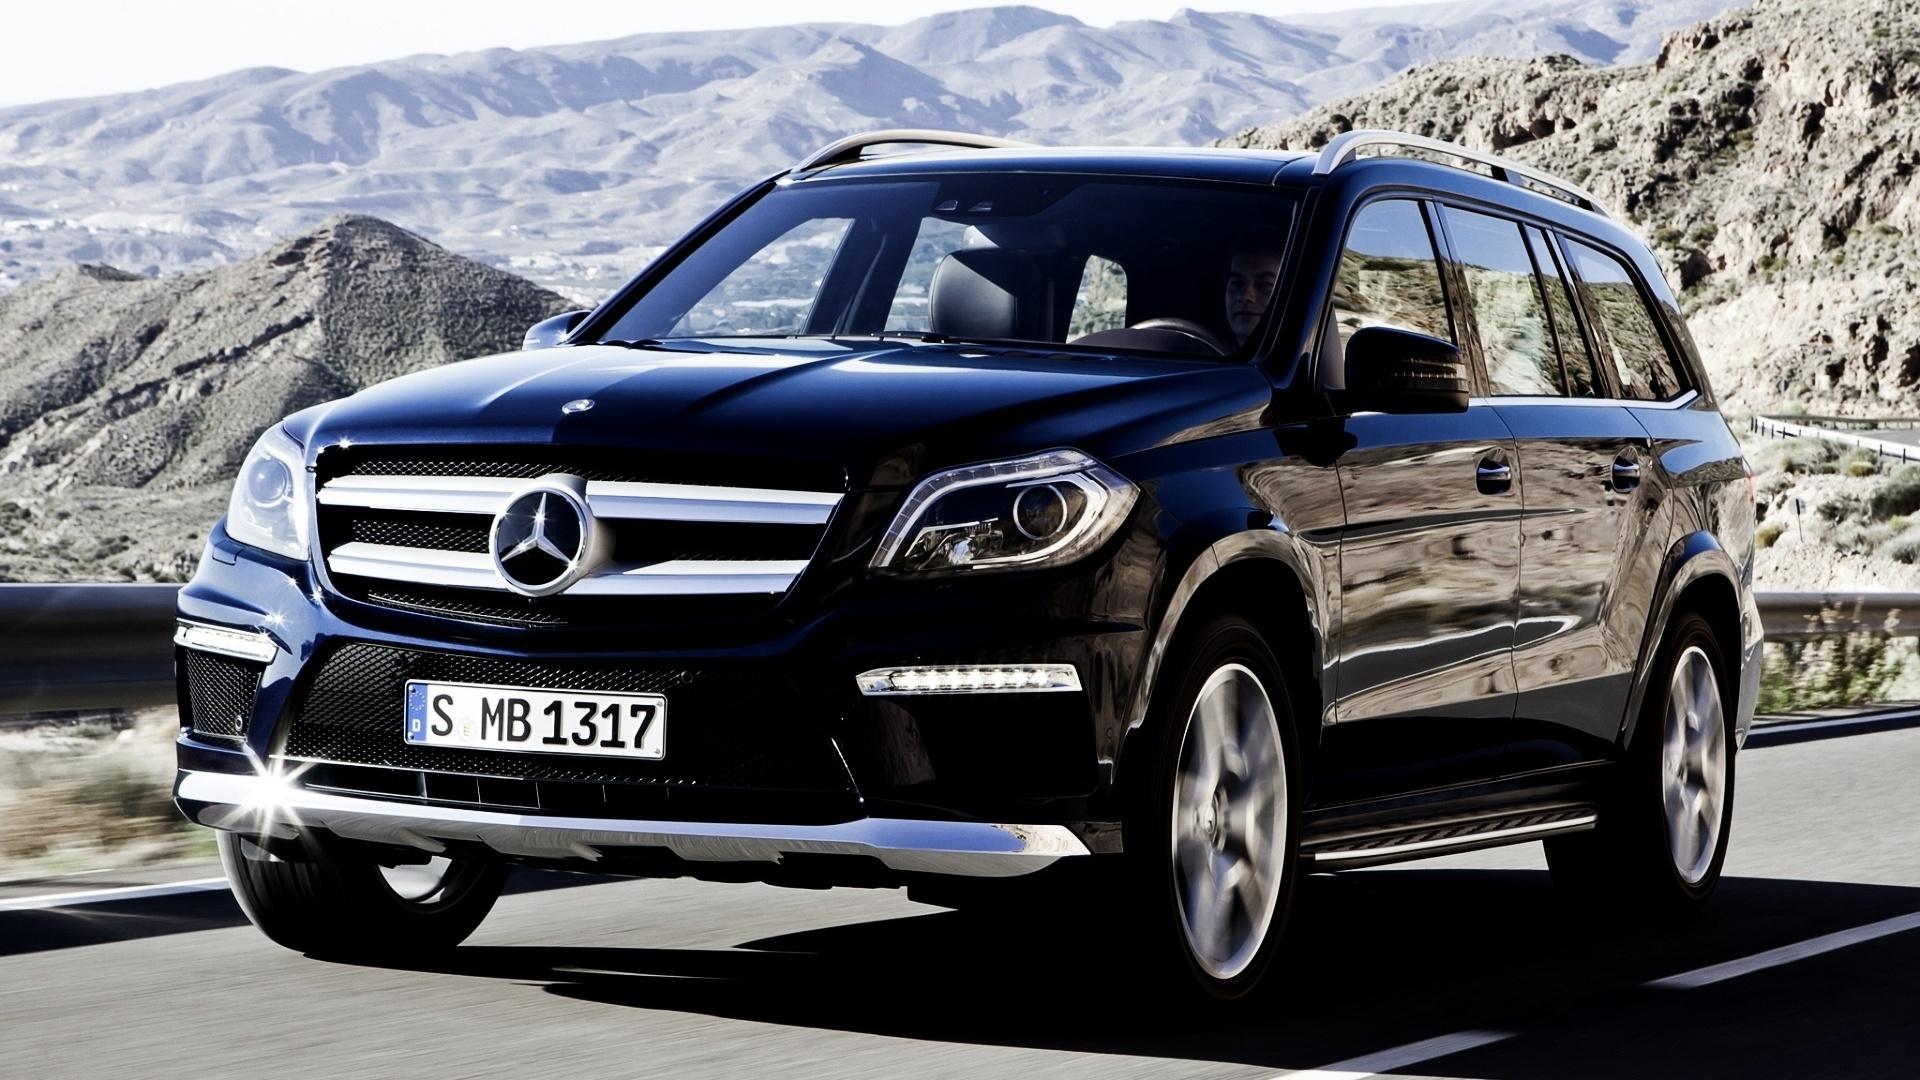 джип, Mercedes-benz, гл, gl, 350, мерседес, передок, bluetec, синий